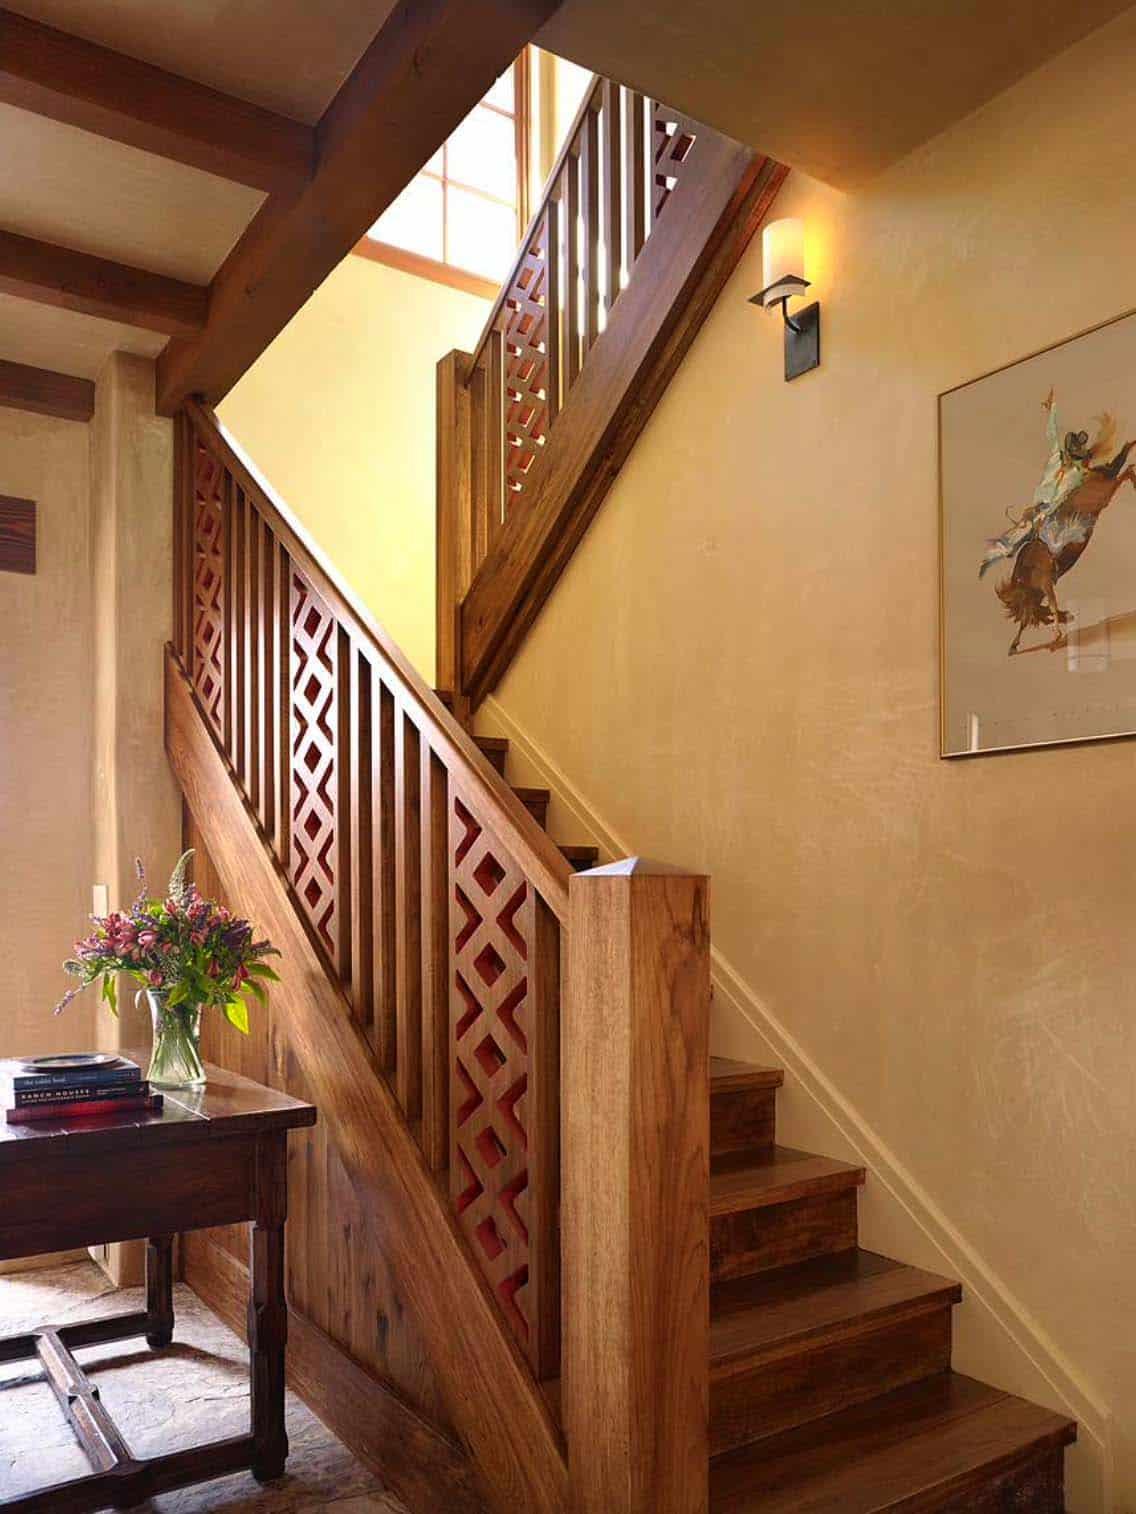 Mediterranean Style Home-Scavullo Design-07-1 Kindesign